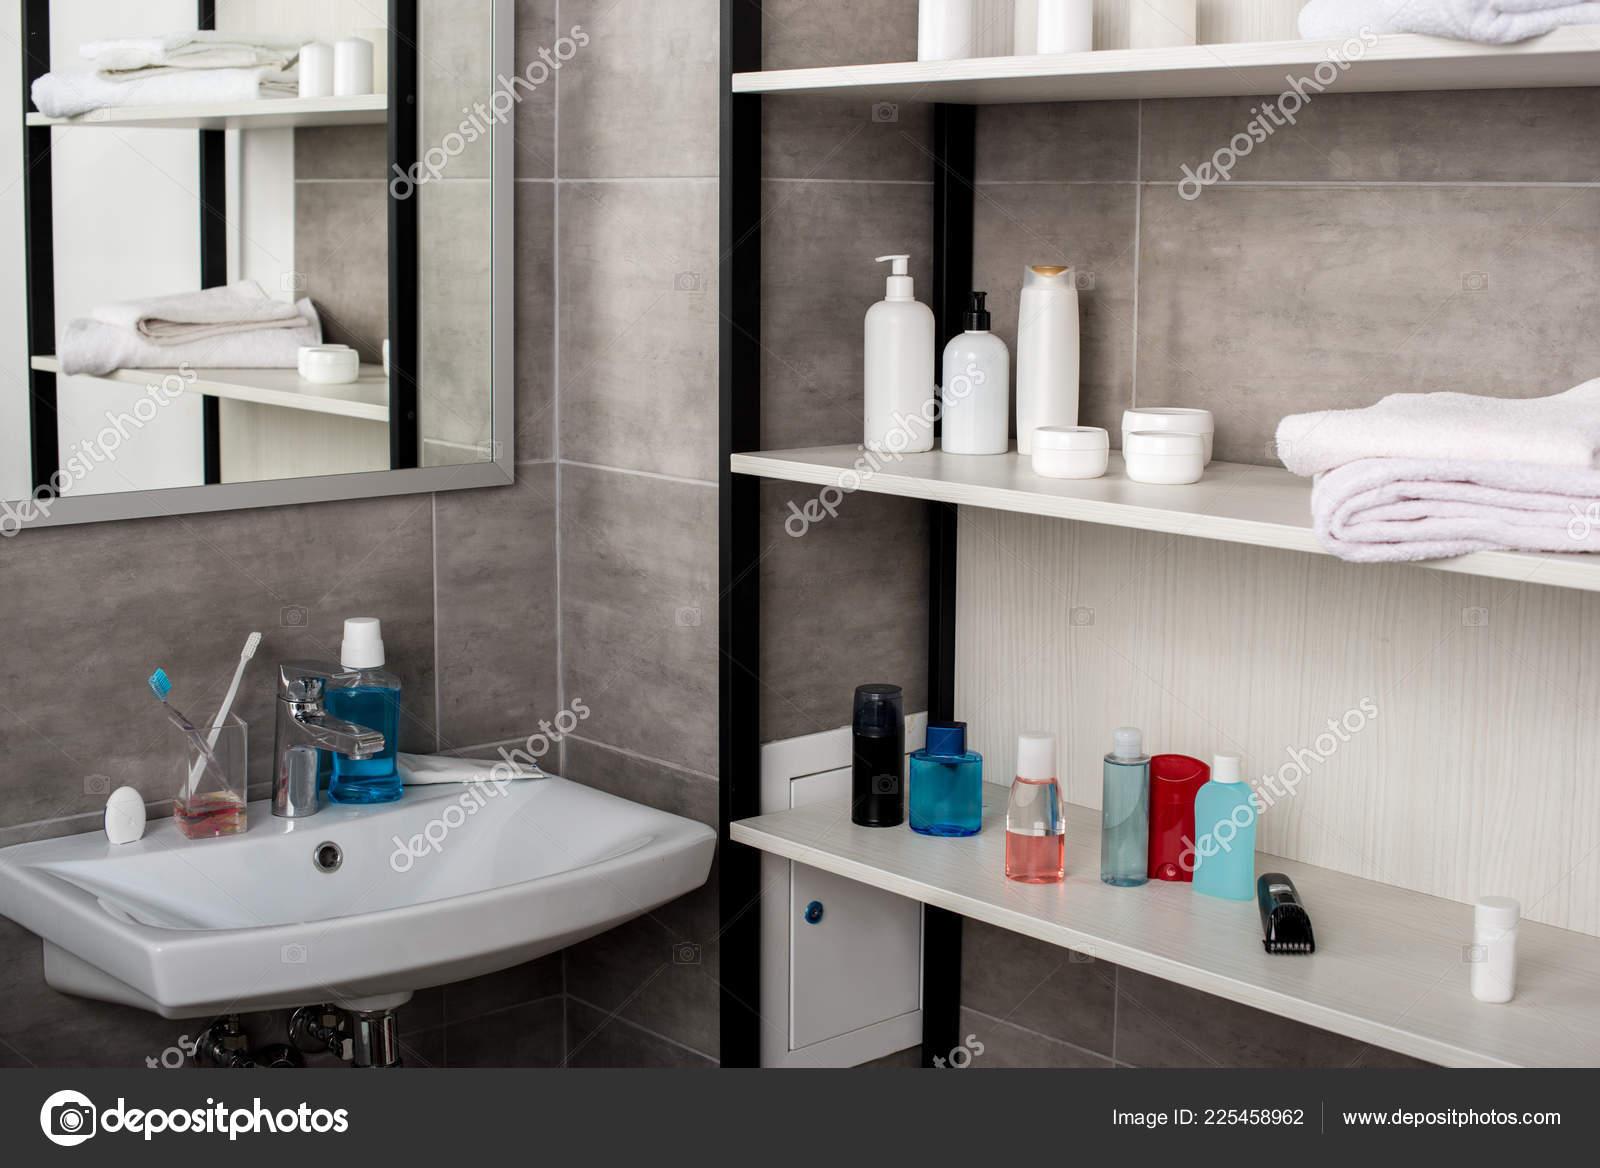 Selective Focus Modern Bathroom Sinks Shelves Beauty Products — Stock Photo